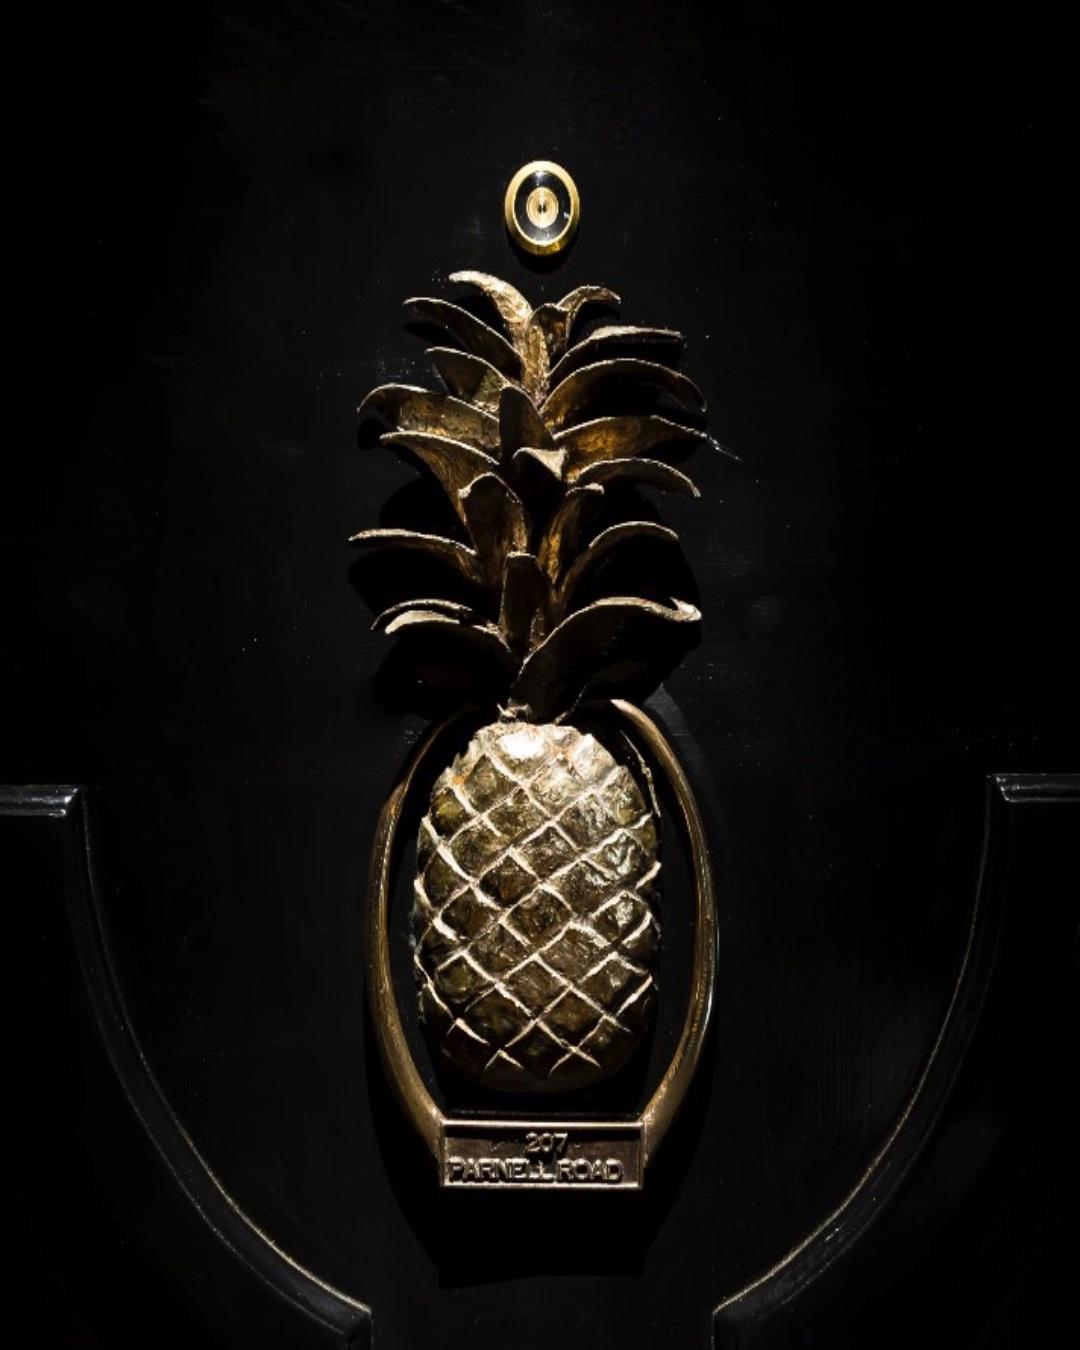 Brass pineapple door knocker on the door to Pineapple on Parnell.